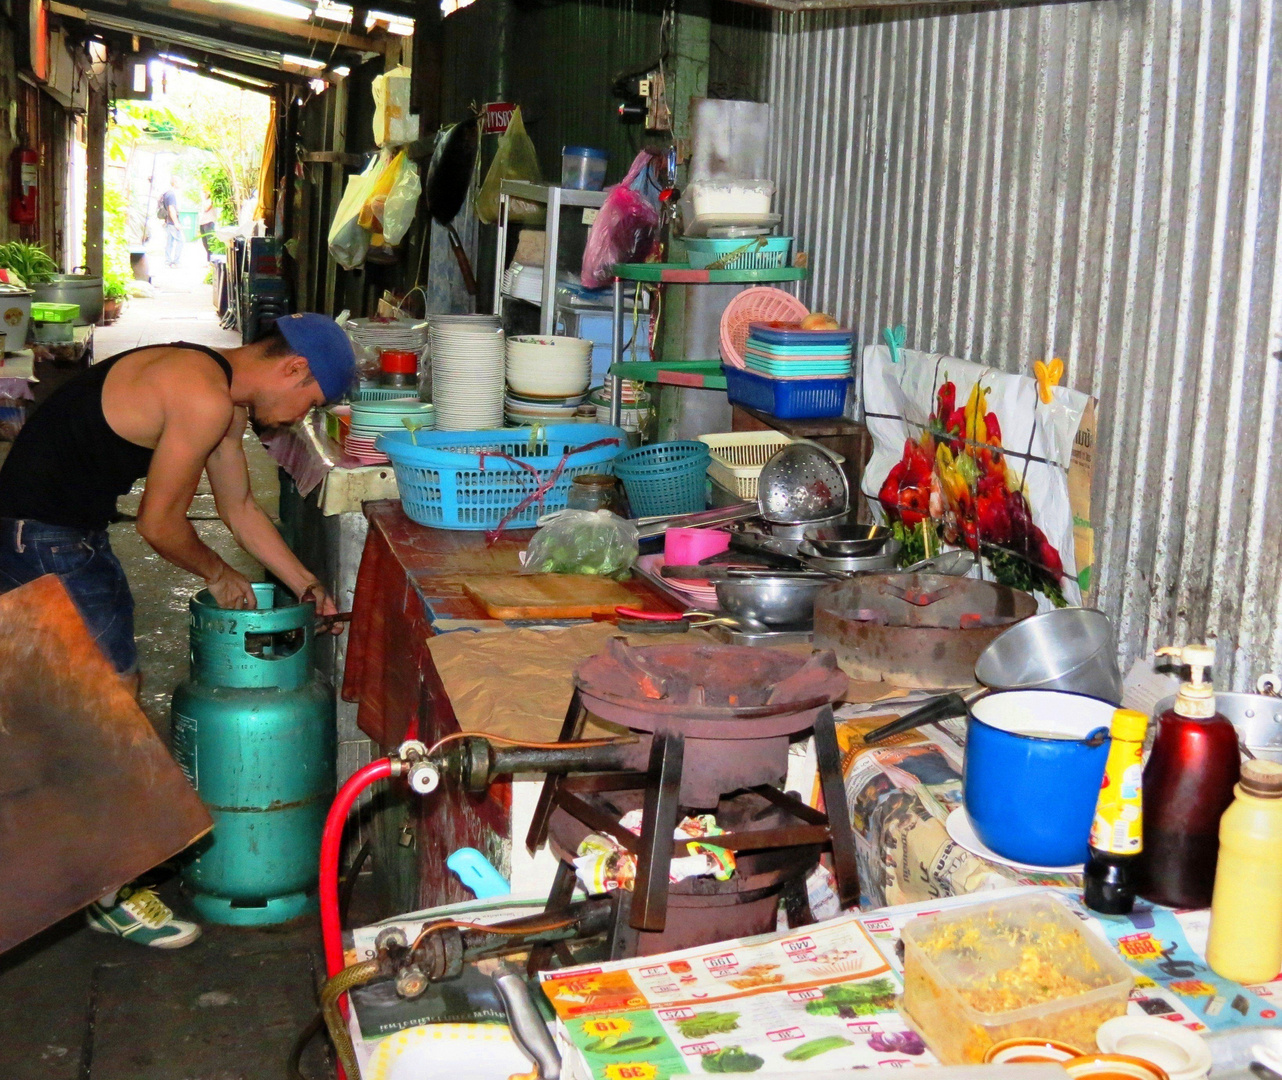 chaos k che foto bild asia thailand southeast asia bilder auf fotocommunity. Black Bedroom Furniture Sets. Home Design Ideas